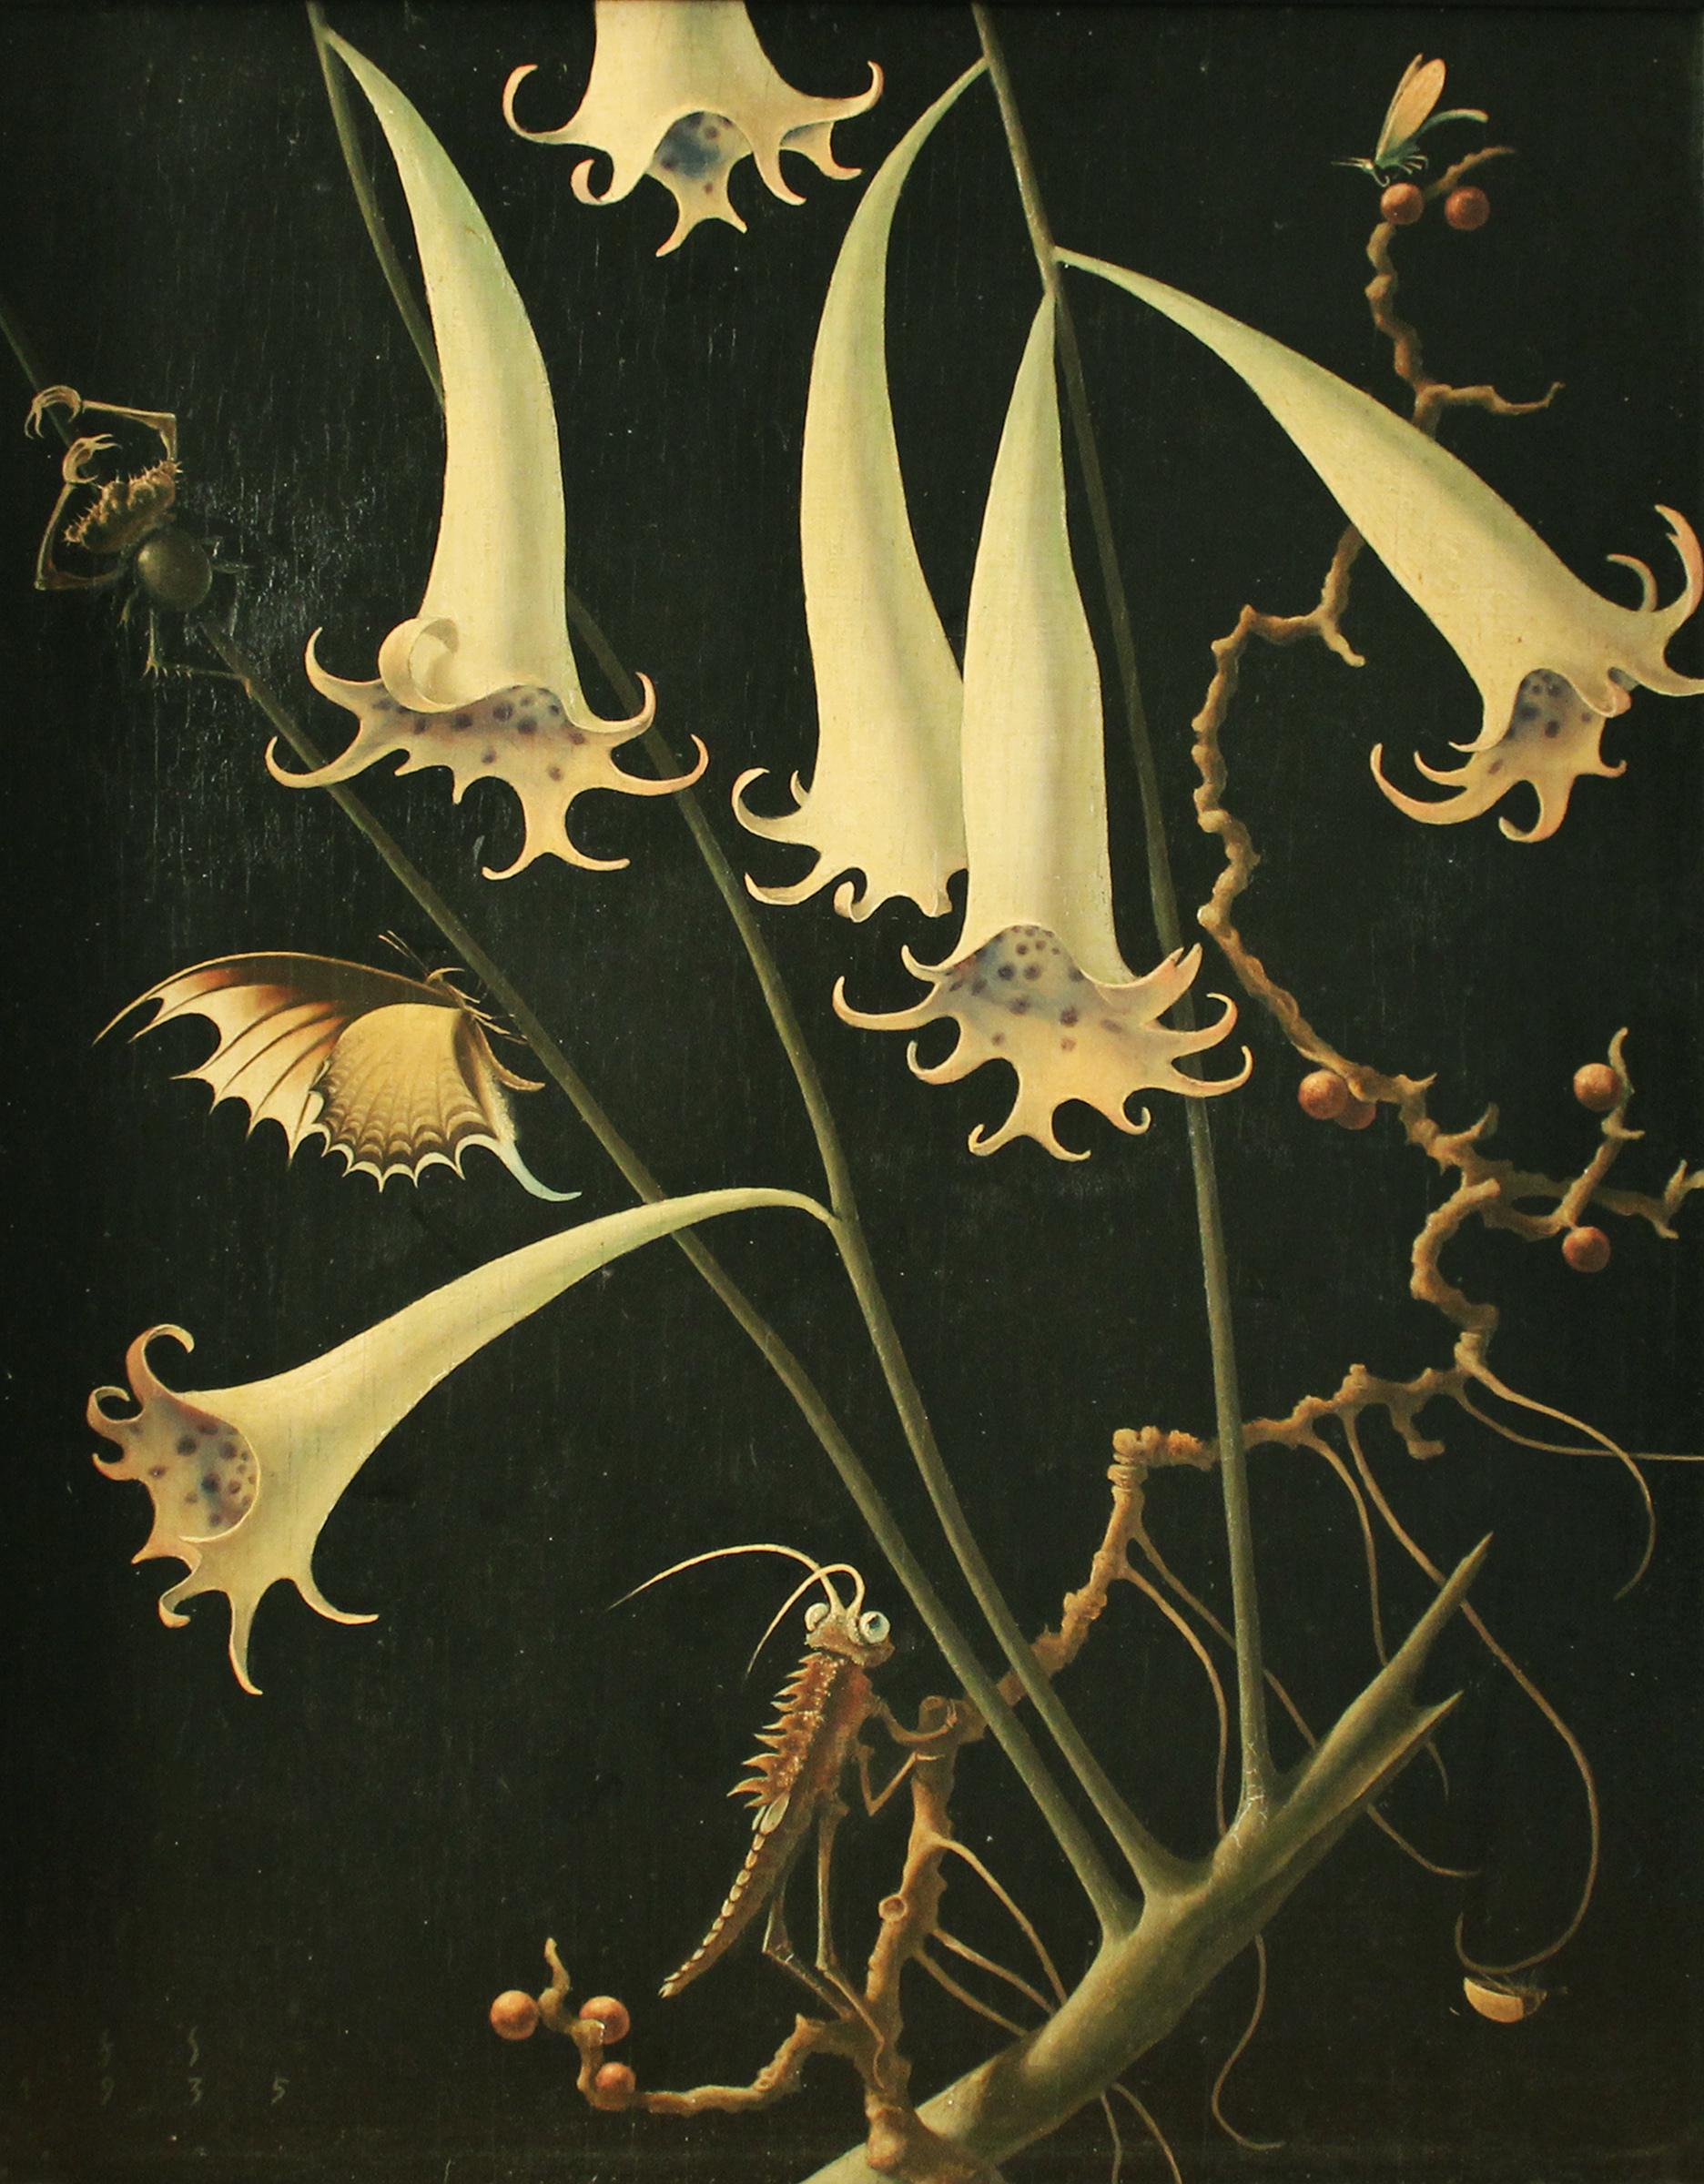 'Blüten und Insekten Nr. 3' par Franz Sedlacek